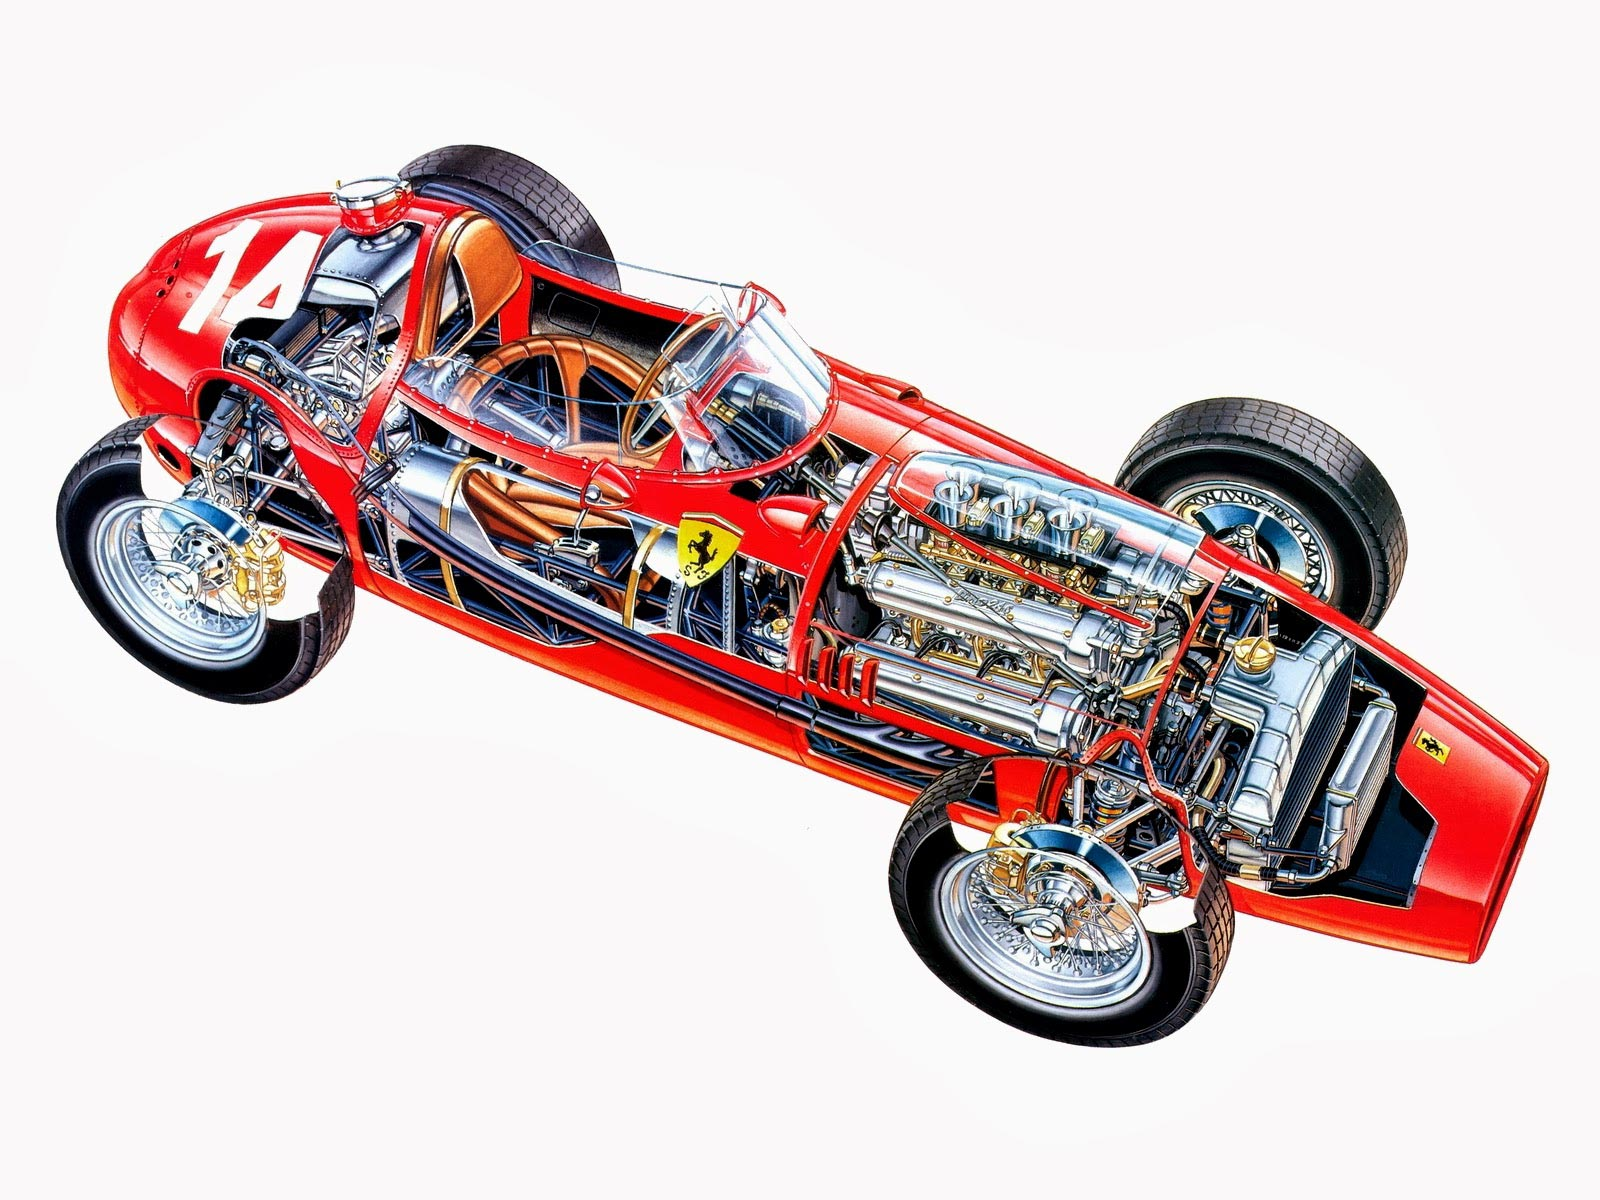 Ferrari 246 F1 cutaway